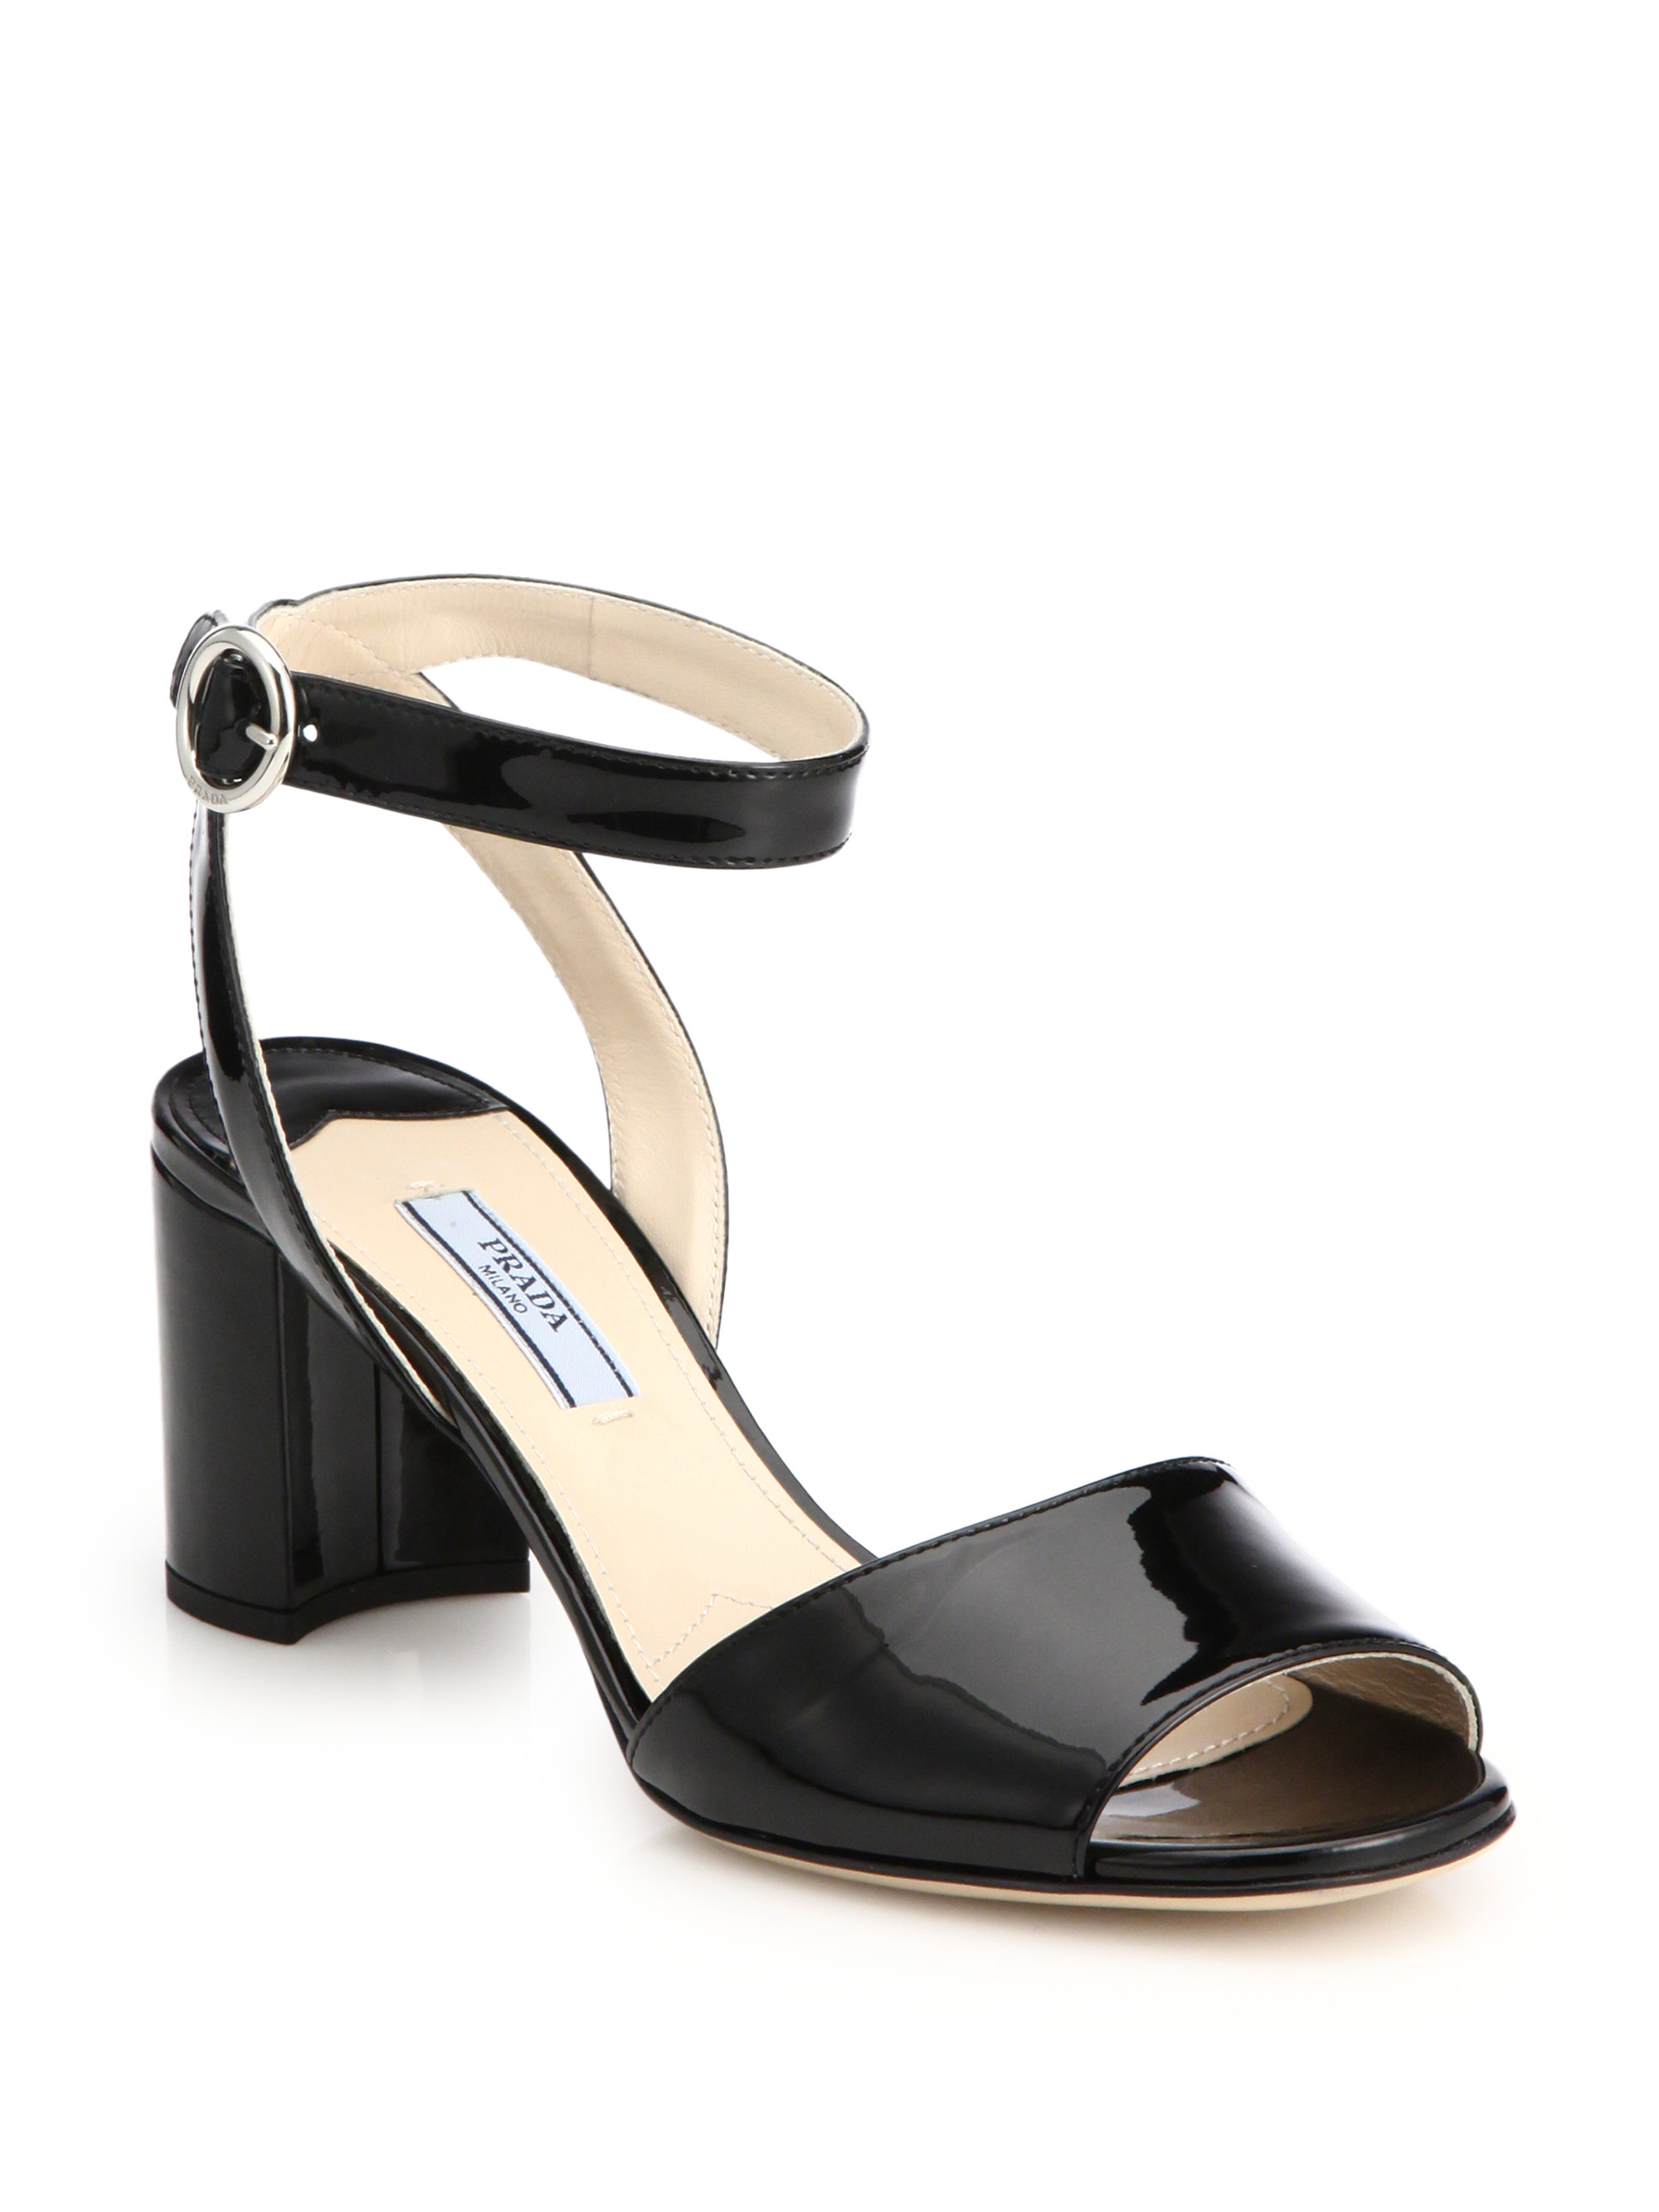 Sandals - Woven Suede Sandals Black - black - Sandals for ladies Prada ywFzQtI